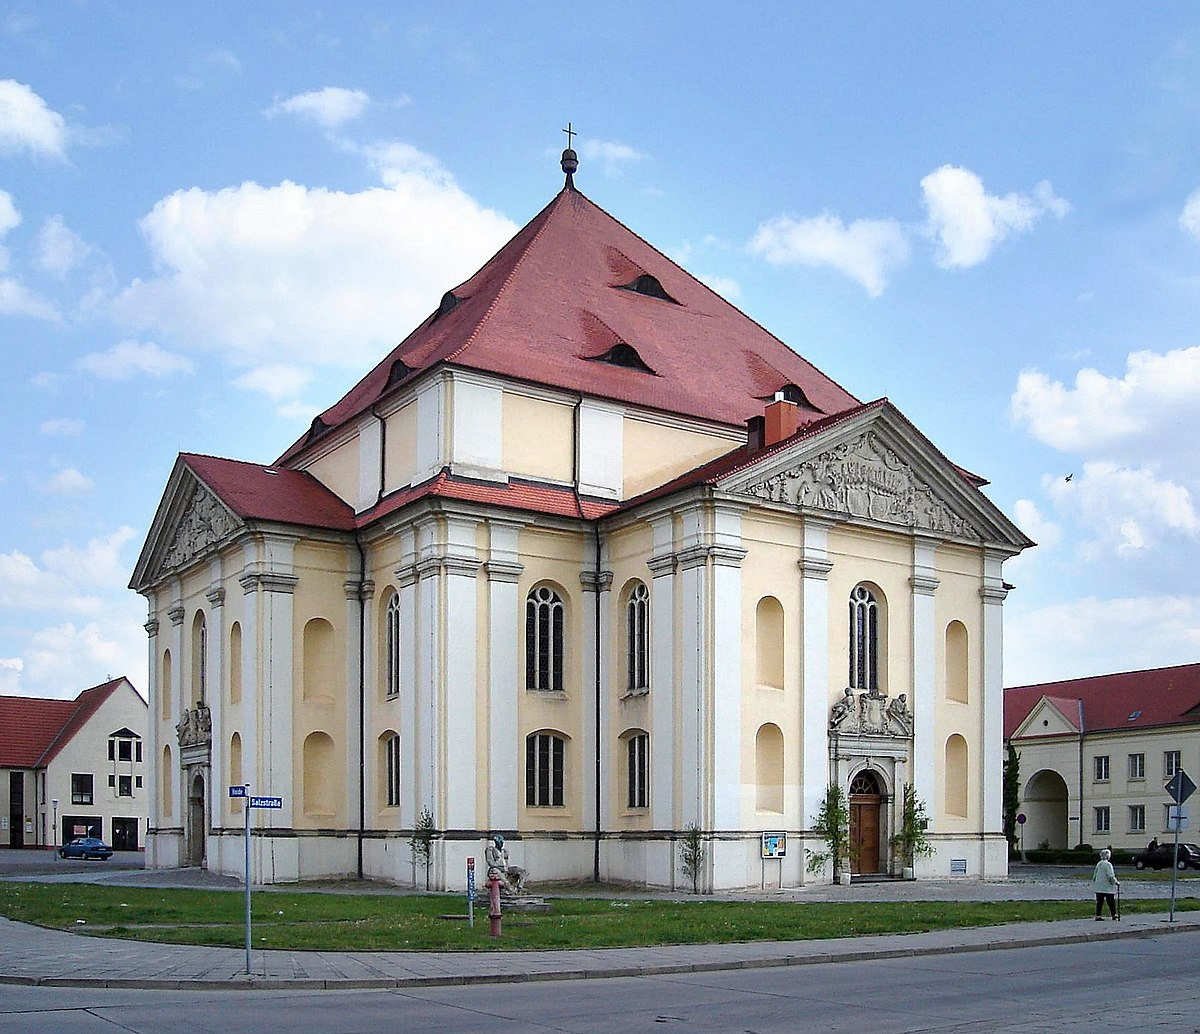 Trinitatis Kirche